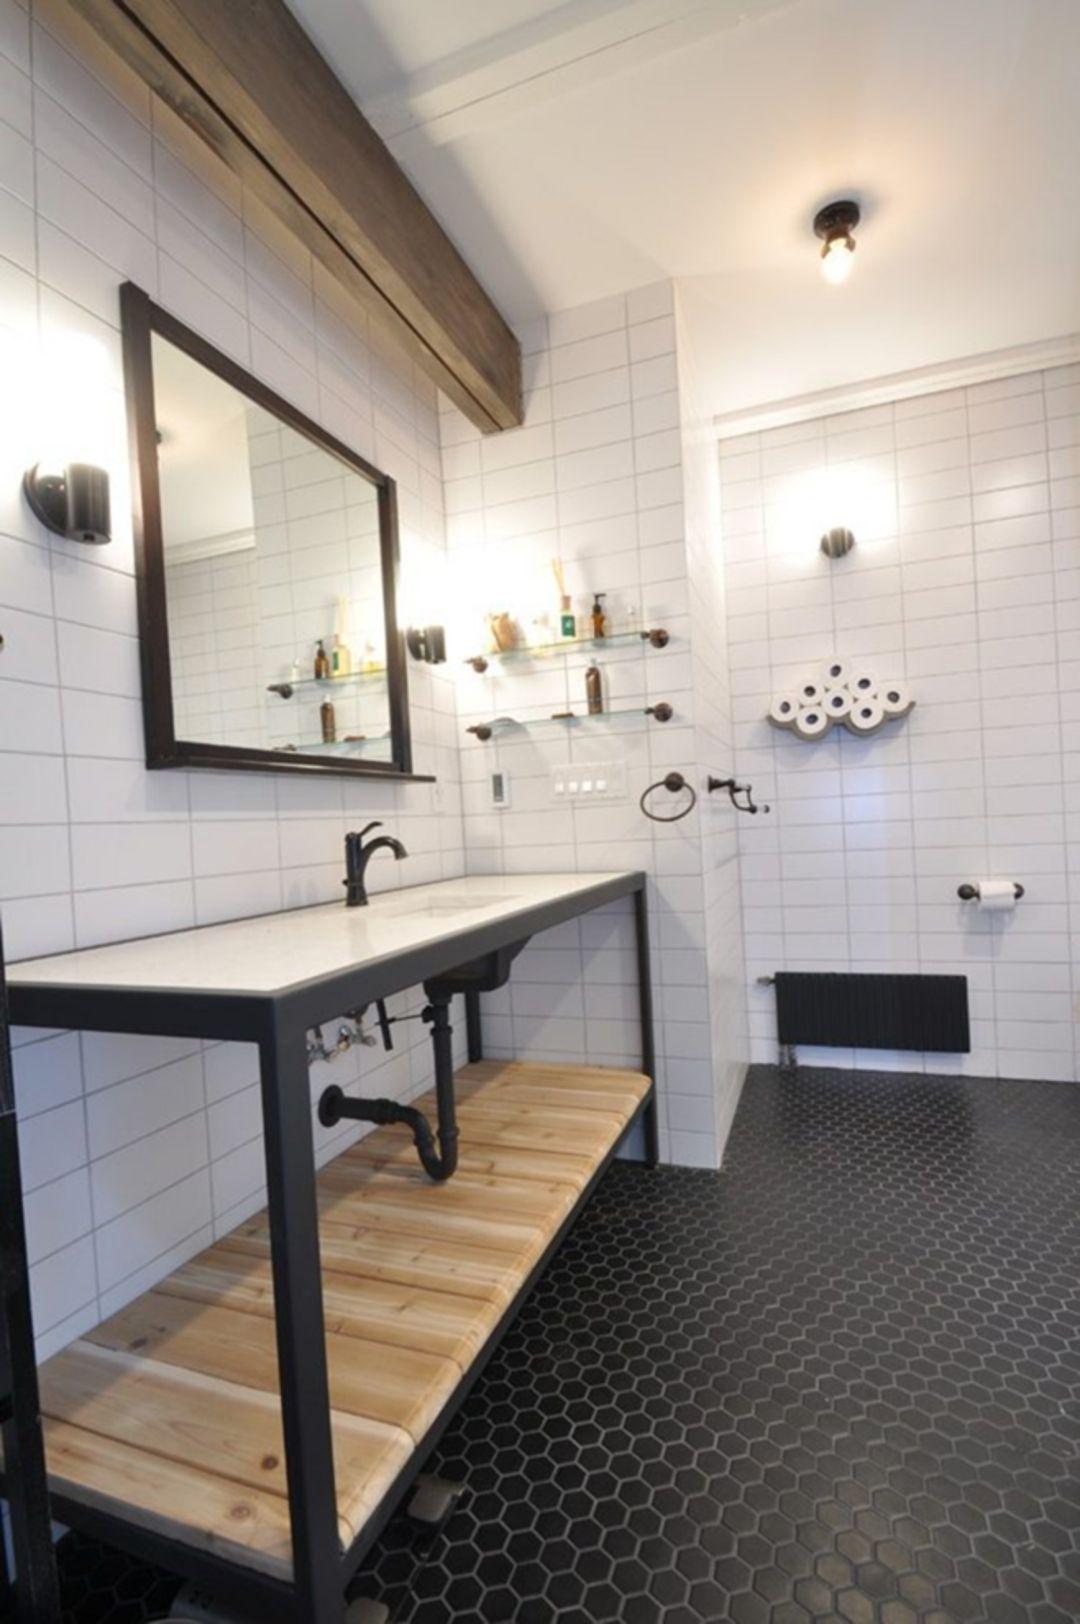 15 stunning industrial bathroom ideas for inspiration